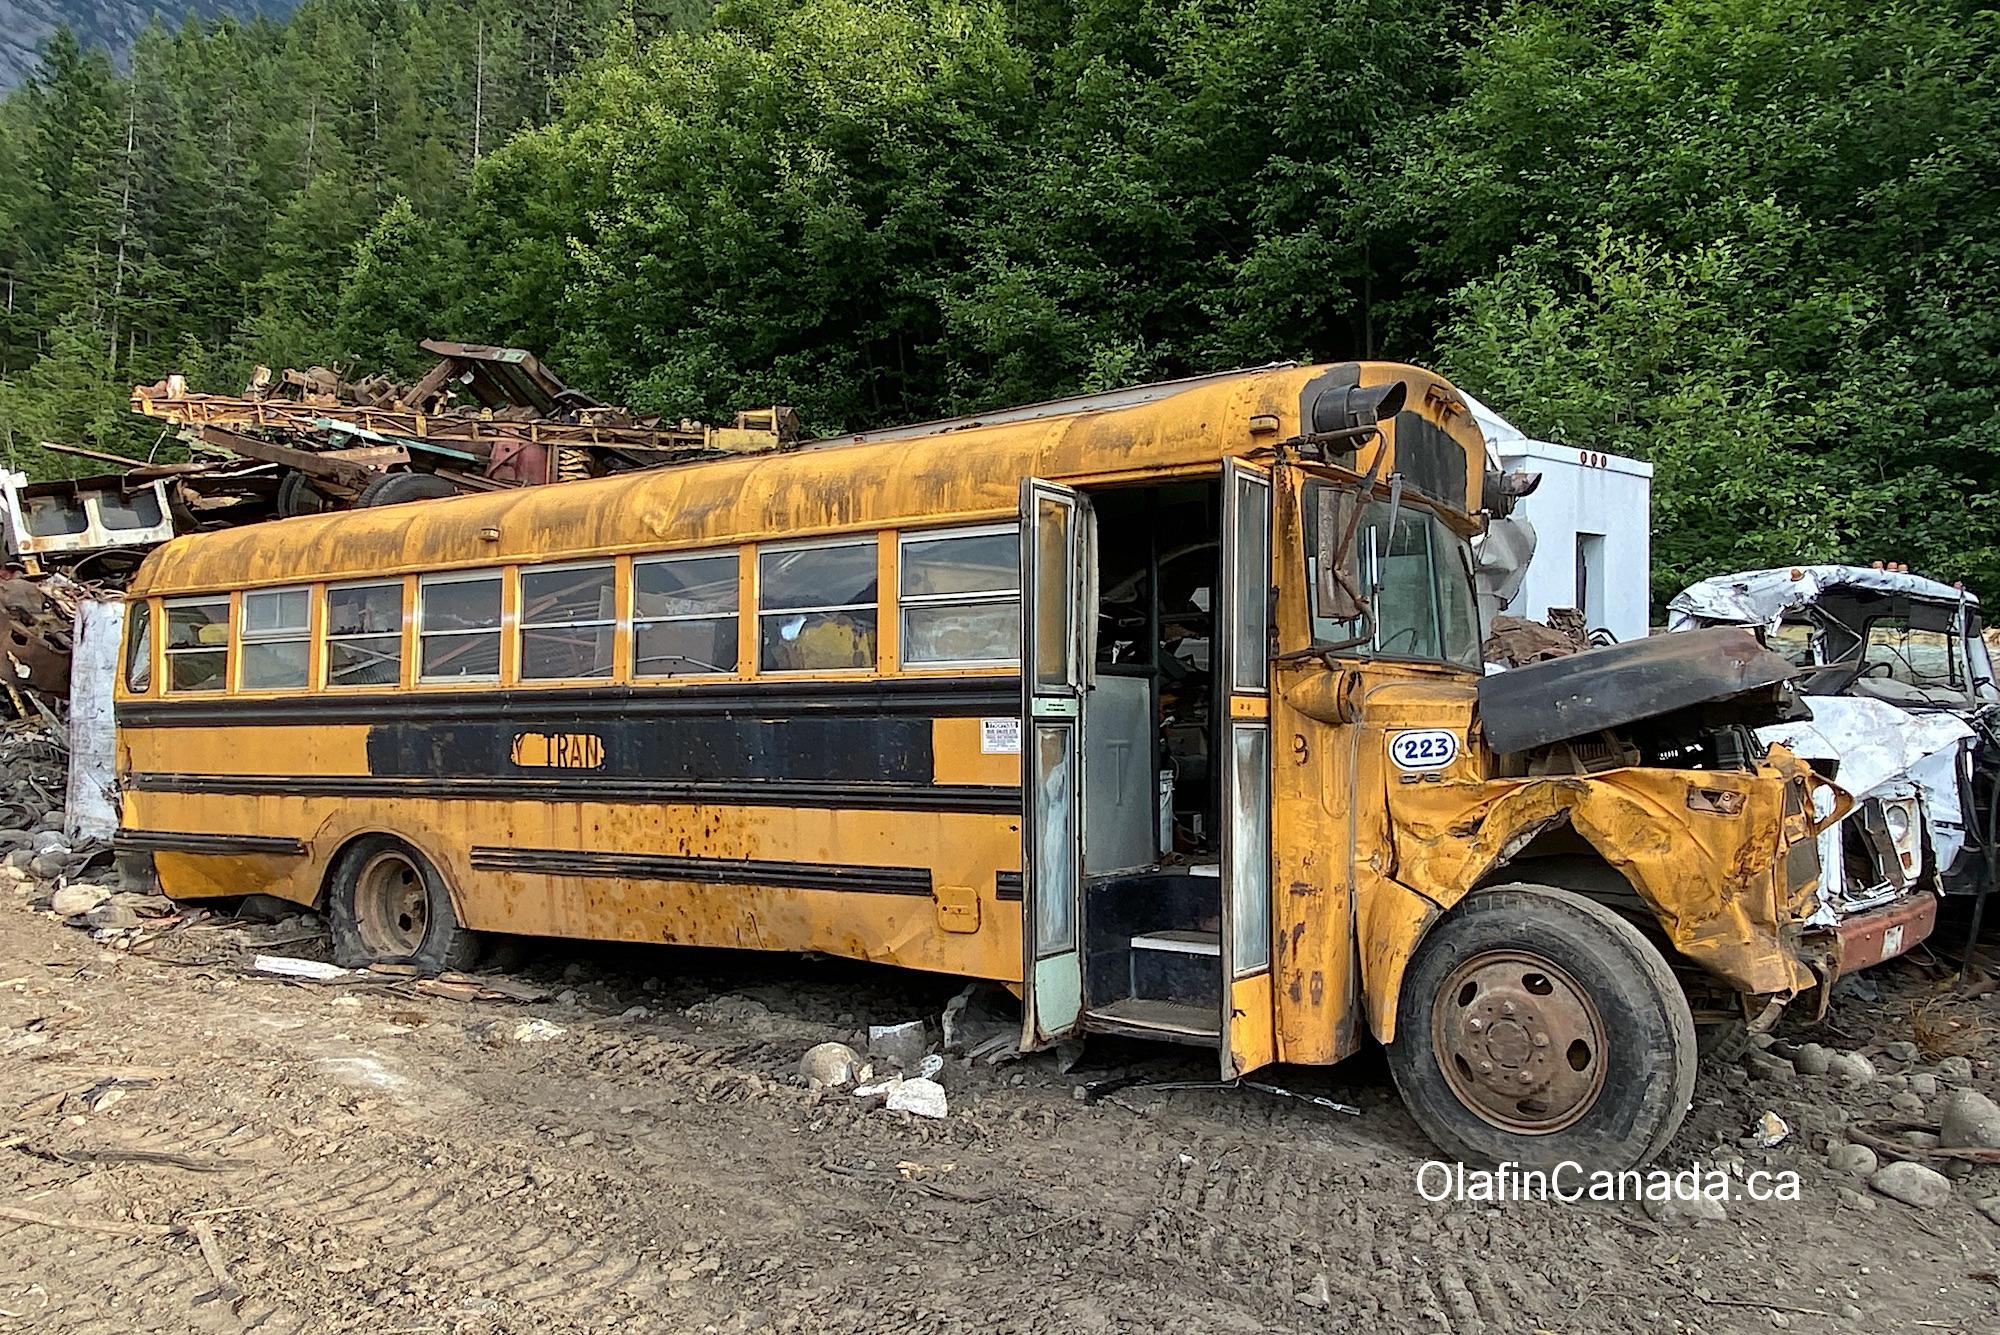 Retired school bus in Bella Coola BC #olafincanada #britishcolumbia #discoverbc #abandonedbc #cariboo #bellacoola #schoolbus